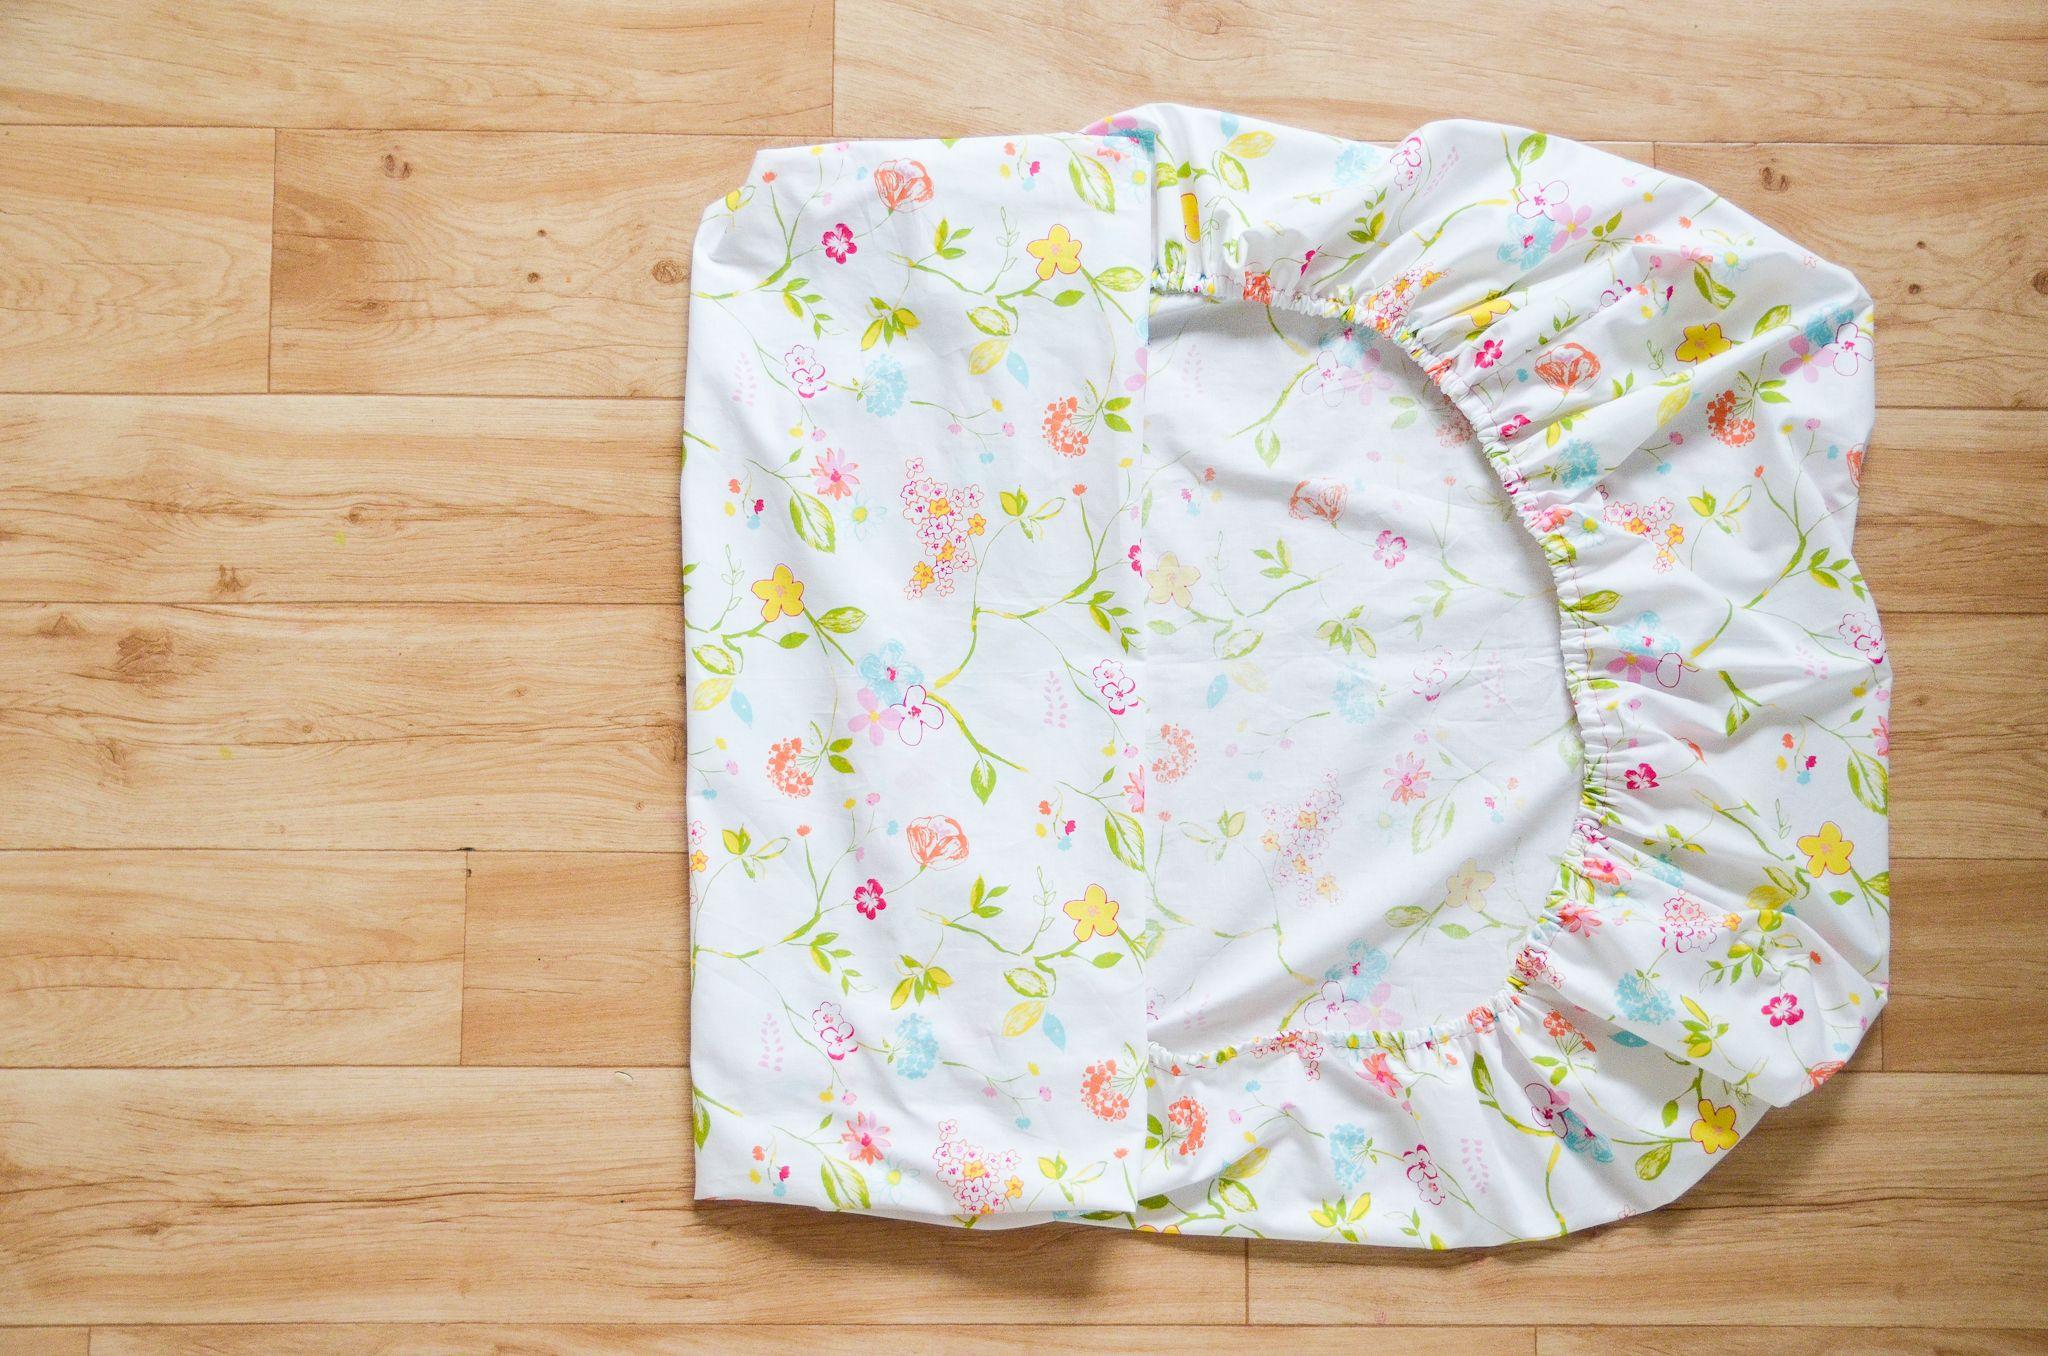 DIY How to Make a Crib Sheet Baby nursery diy, Crib